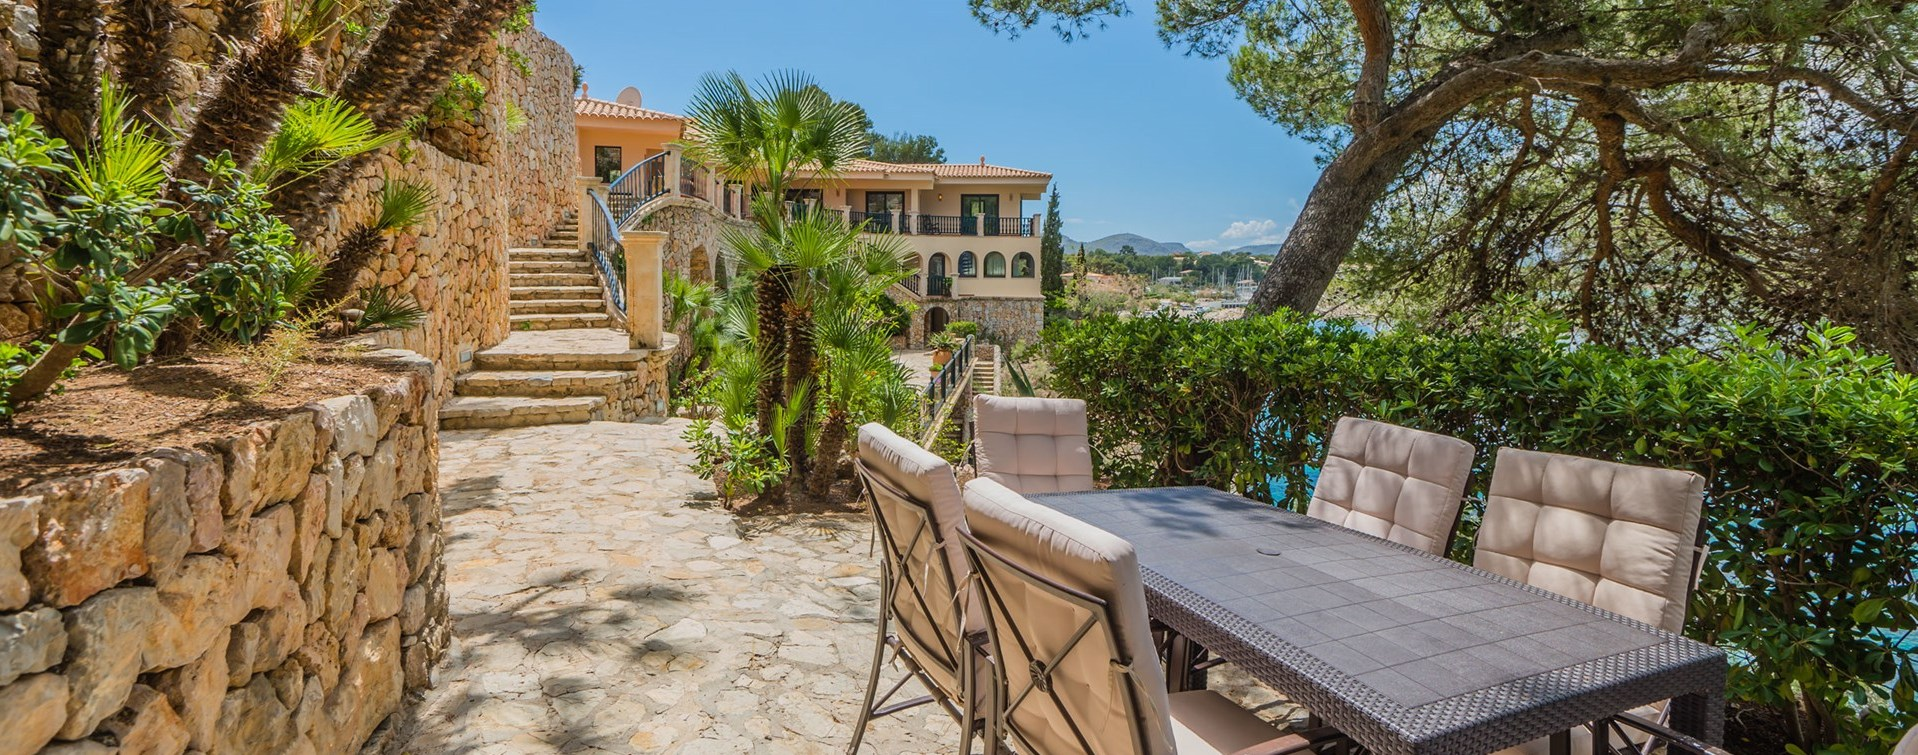 villa-el-mirador-garden-dining